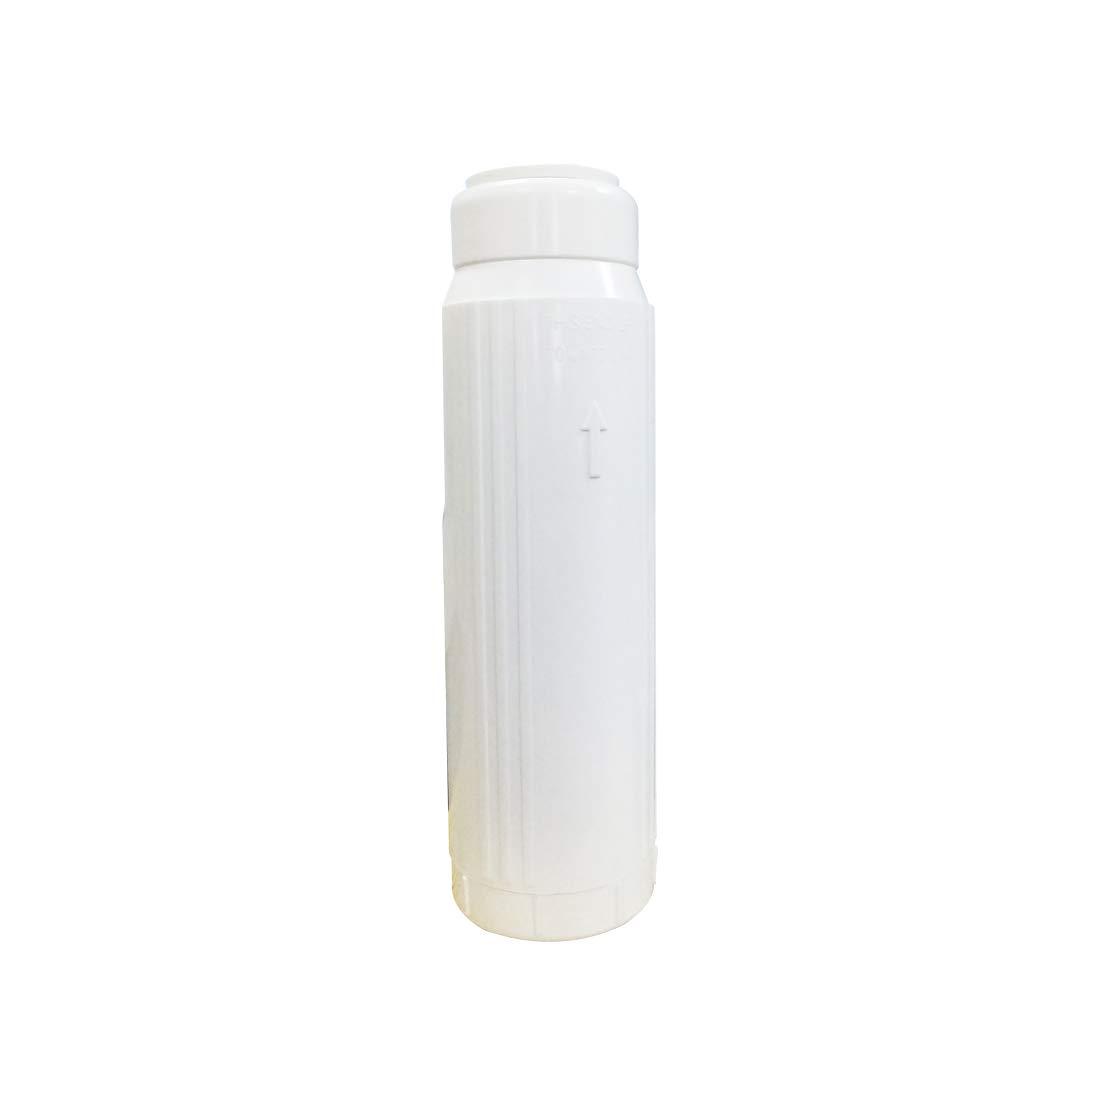 GOSOIT Alkaline Water Filter System Softener System Water Purifier,Counter-top Alkaline Water filter System (filter system) (Yellow-3rd)